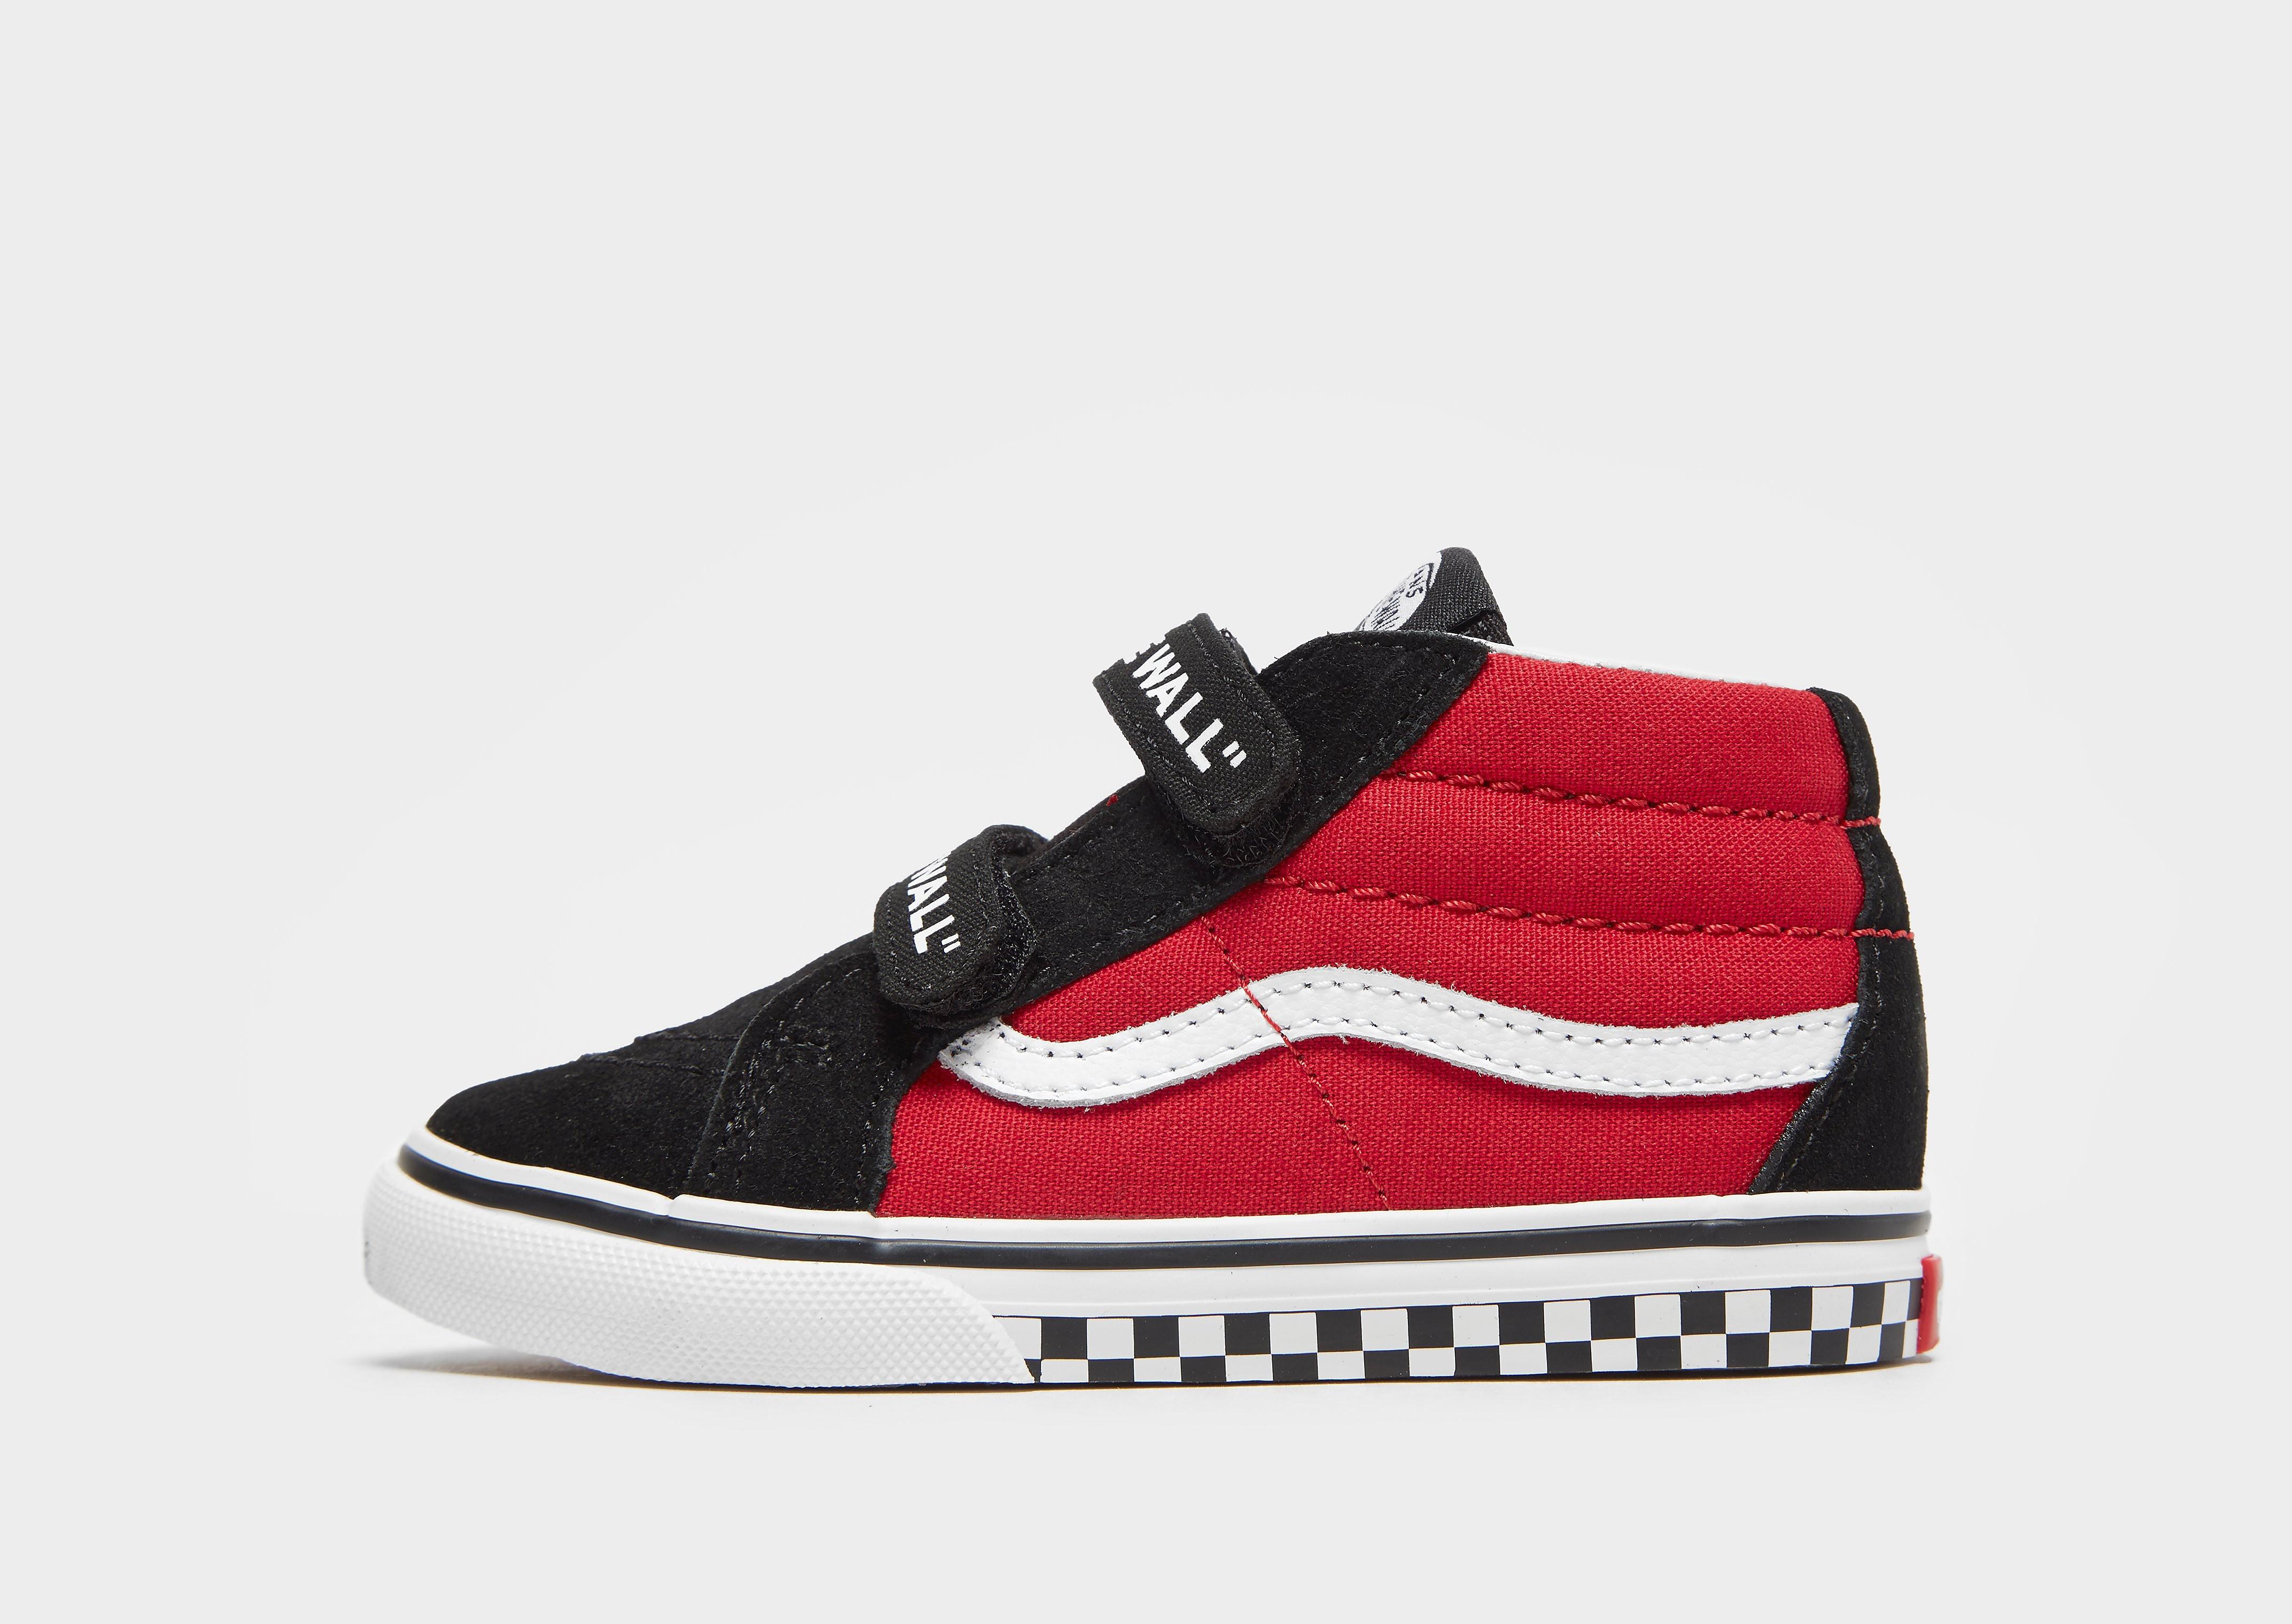 Vans Sk8 kindersneaker zwart, print en rood